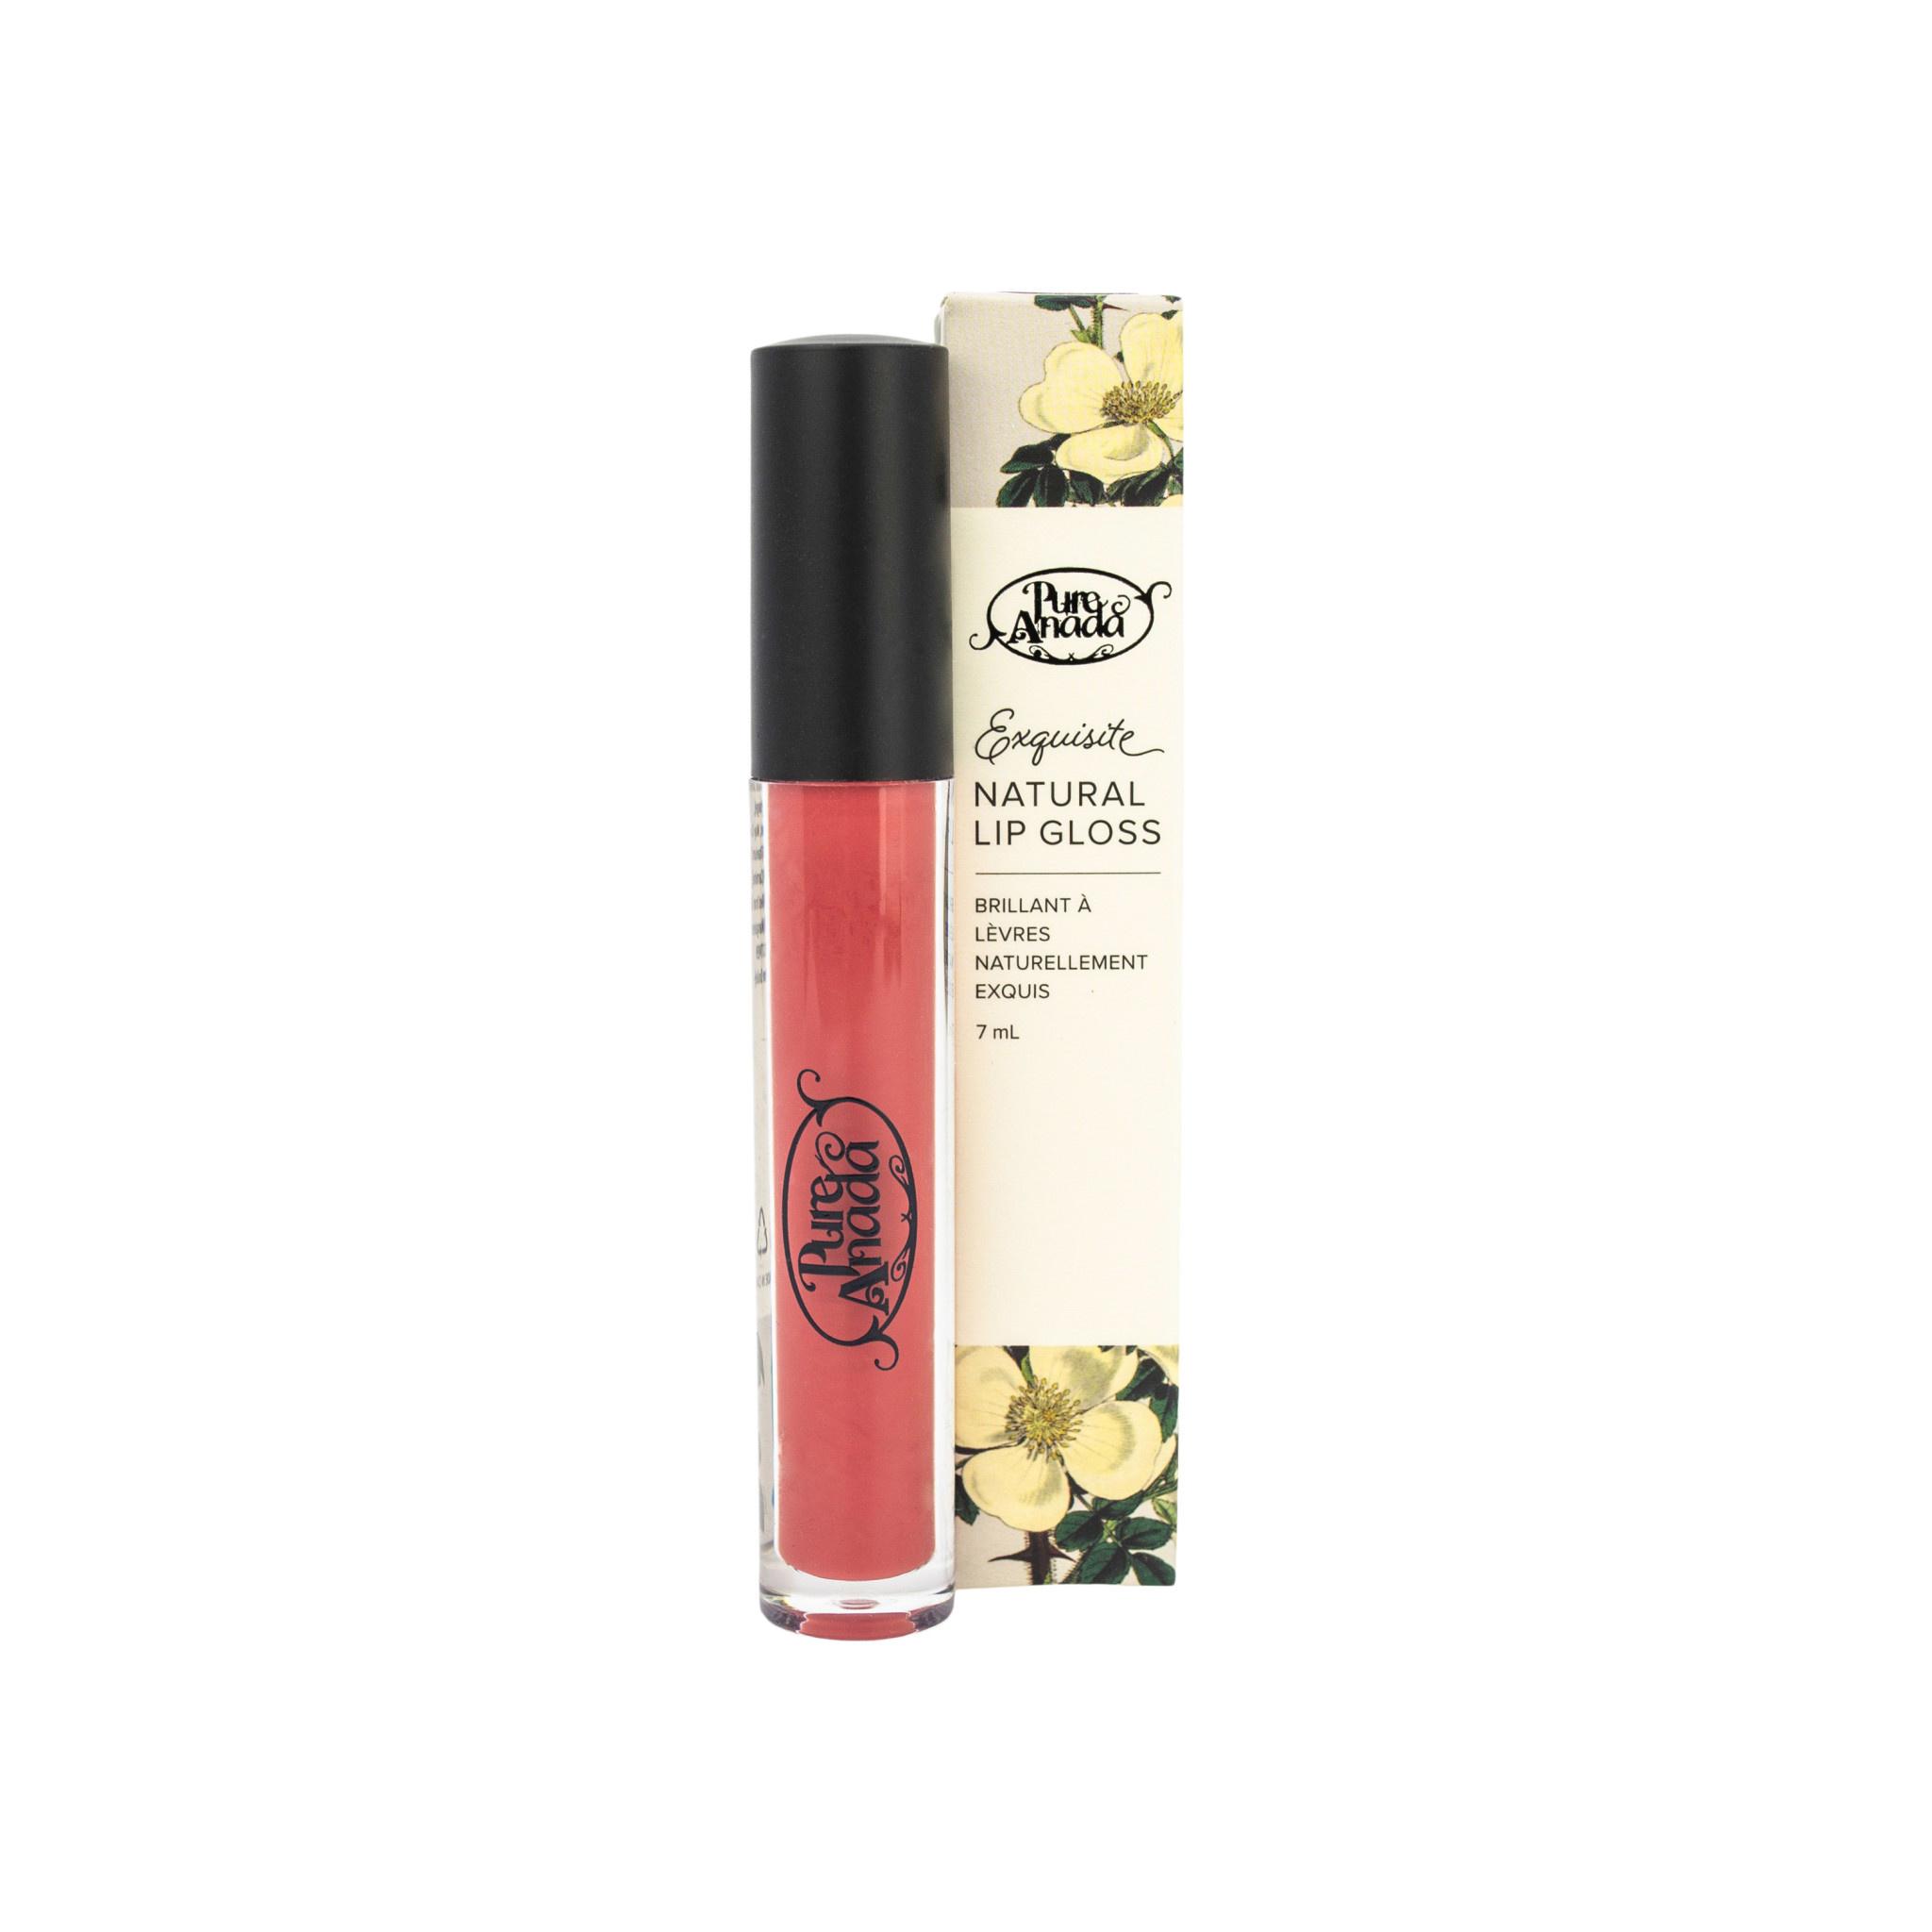 Exquisite Natural Lip Gloss - Pomegranate (Matte)-1